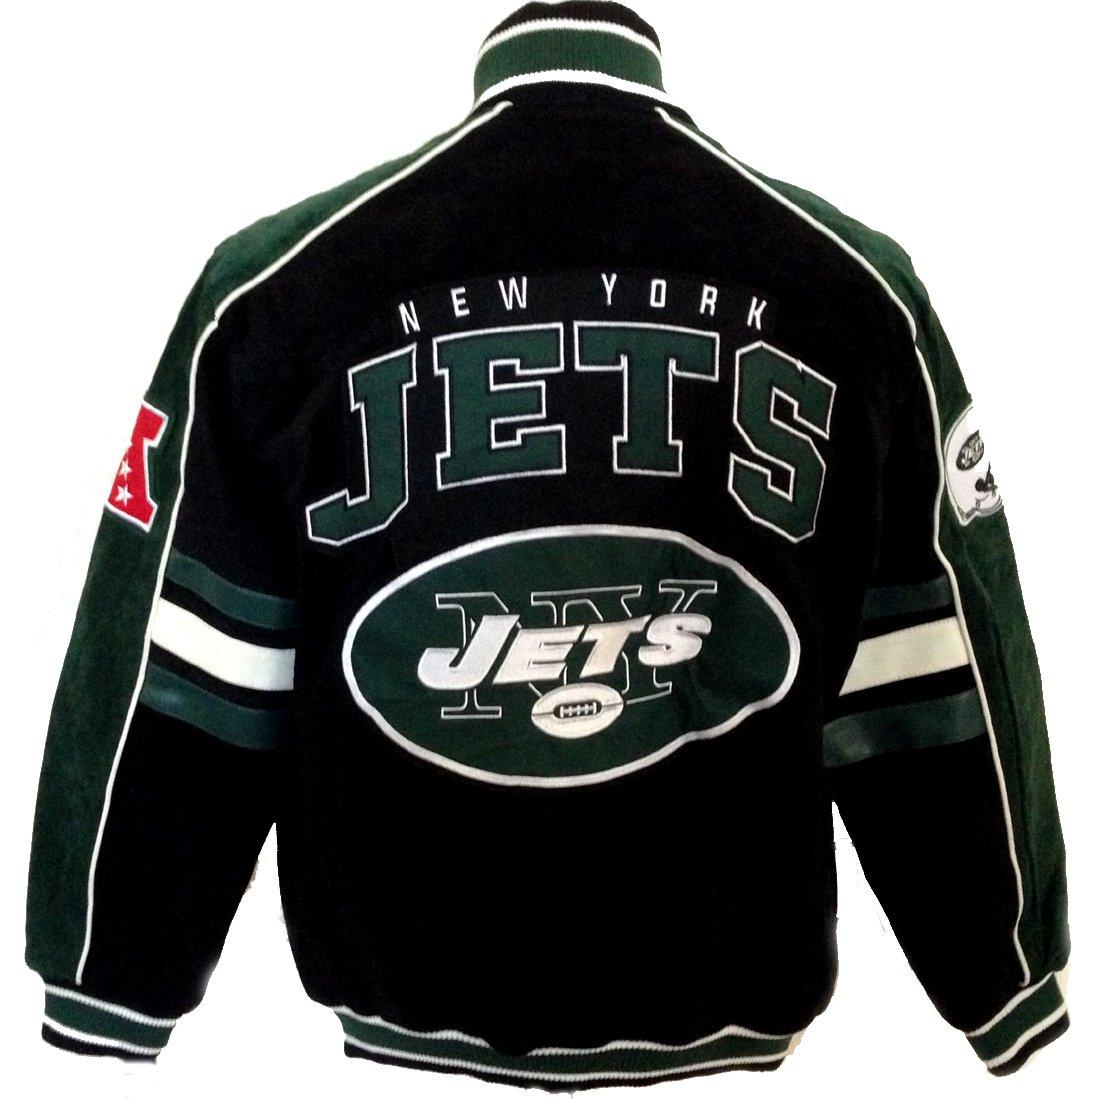 timeless design 4b53b 1cd8d Amazon.com : New York Jets Jacket Suede Leather NFL Jets ...